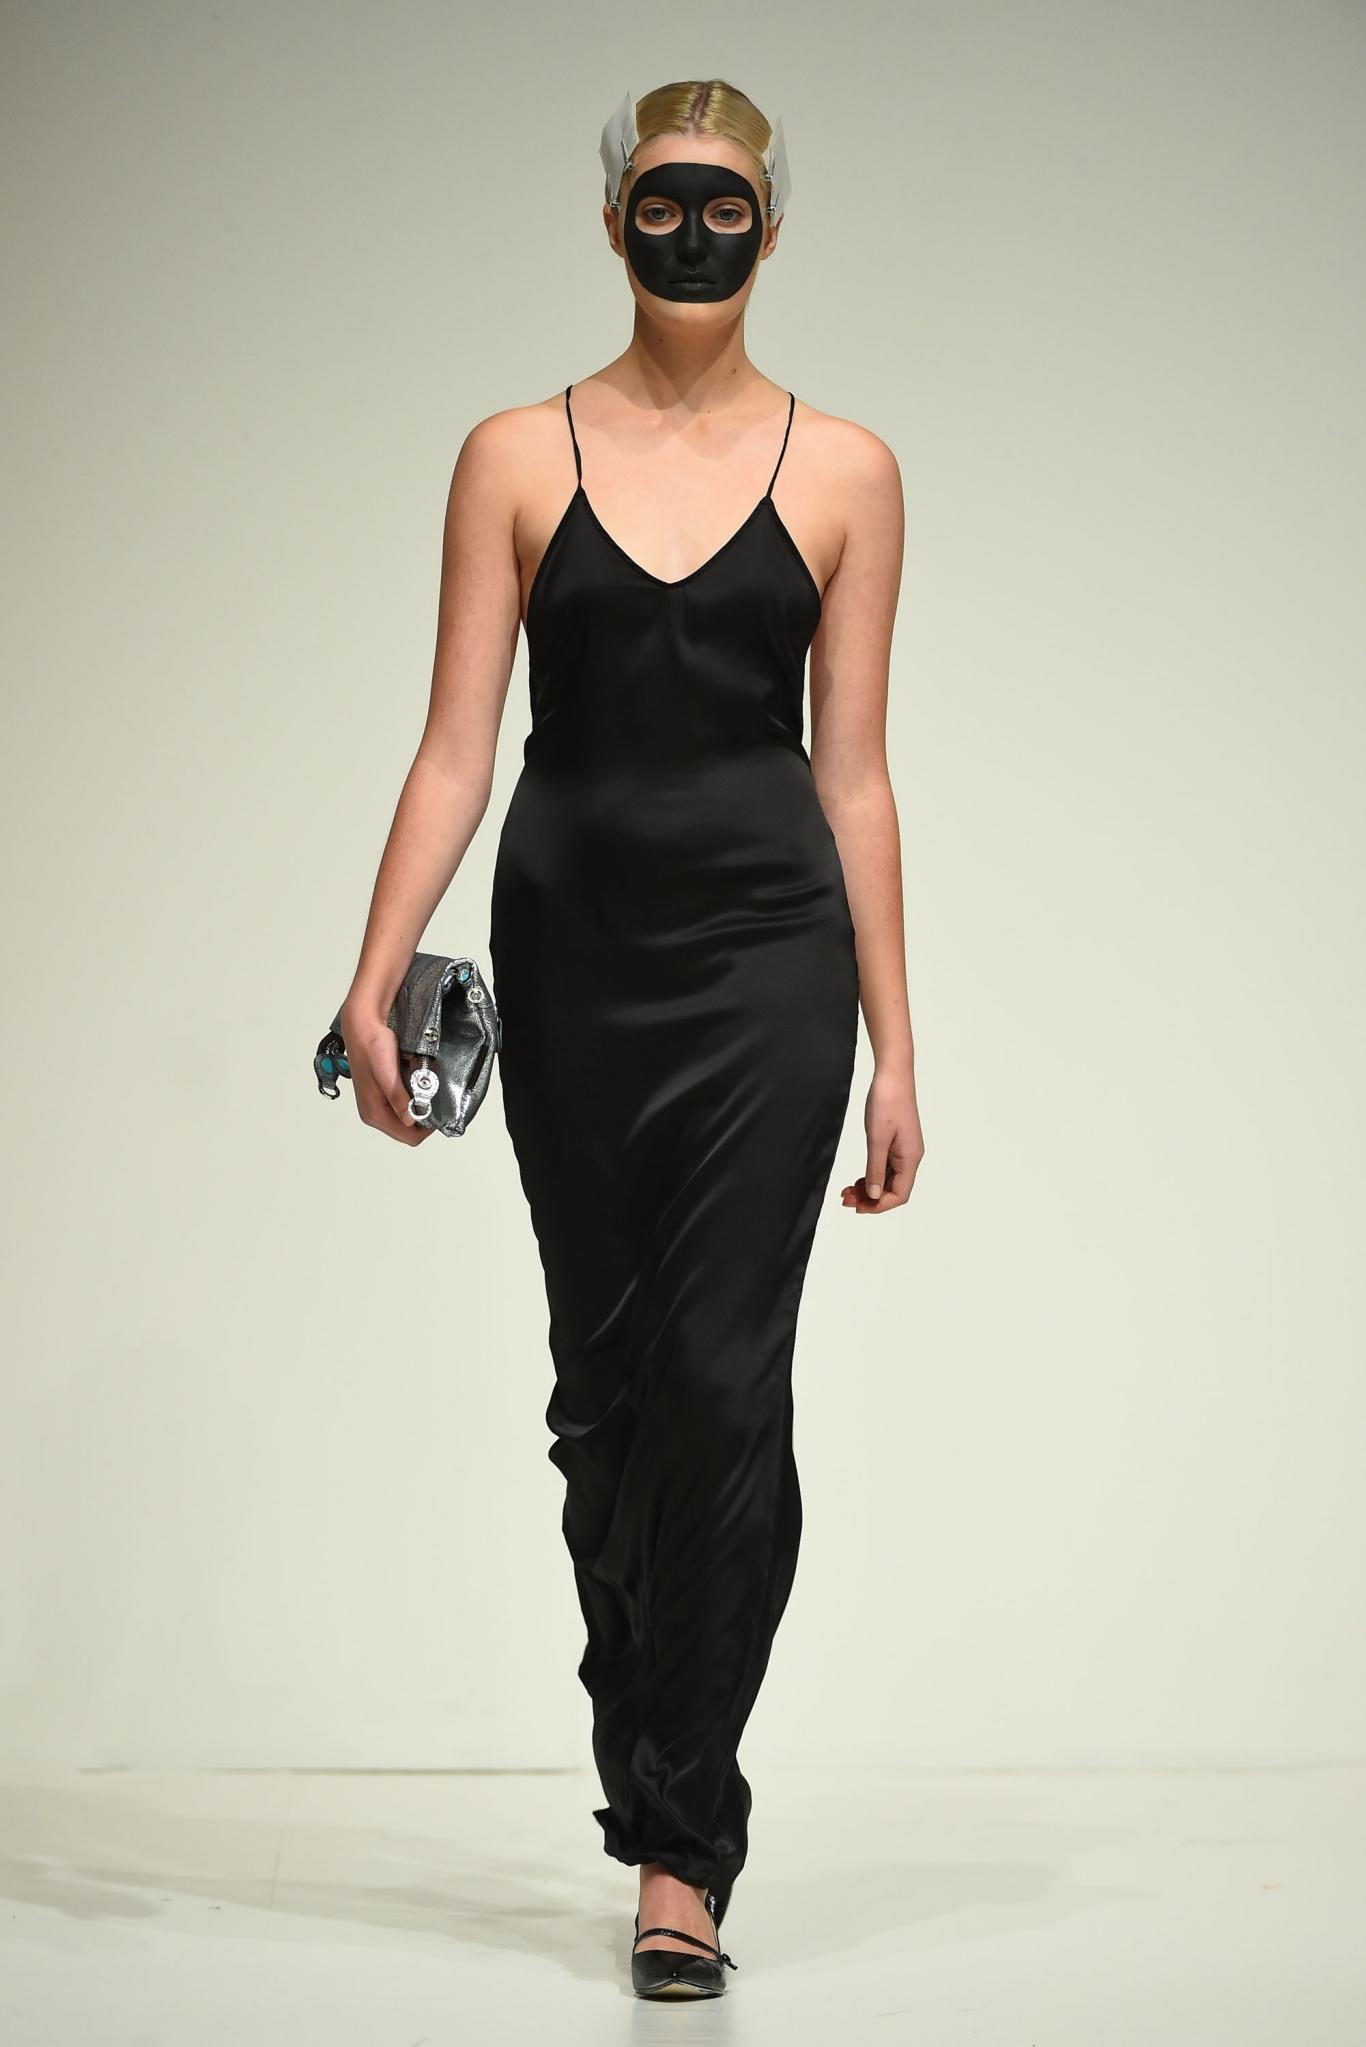 Taller Marmo at Fashion Forward Season 5.